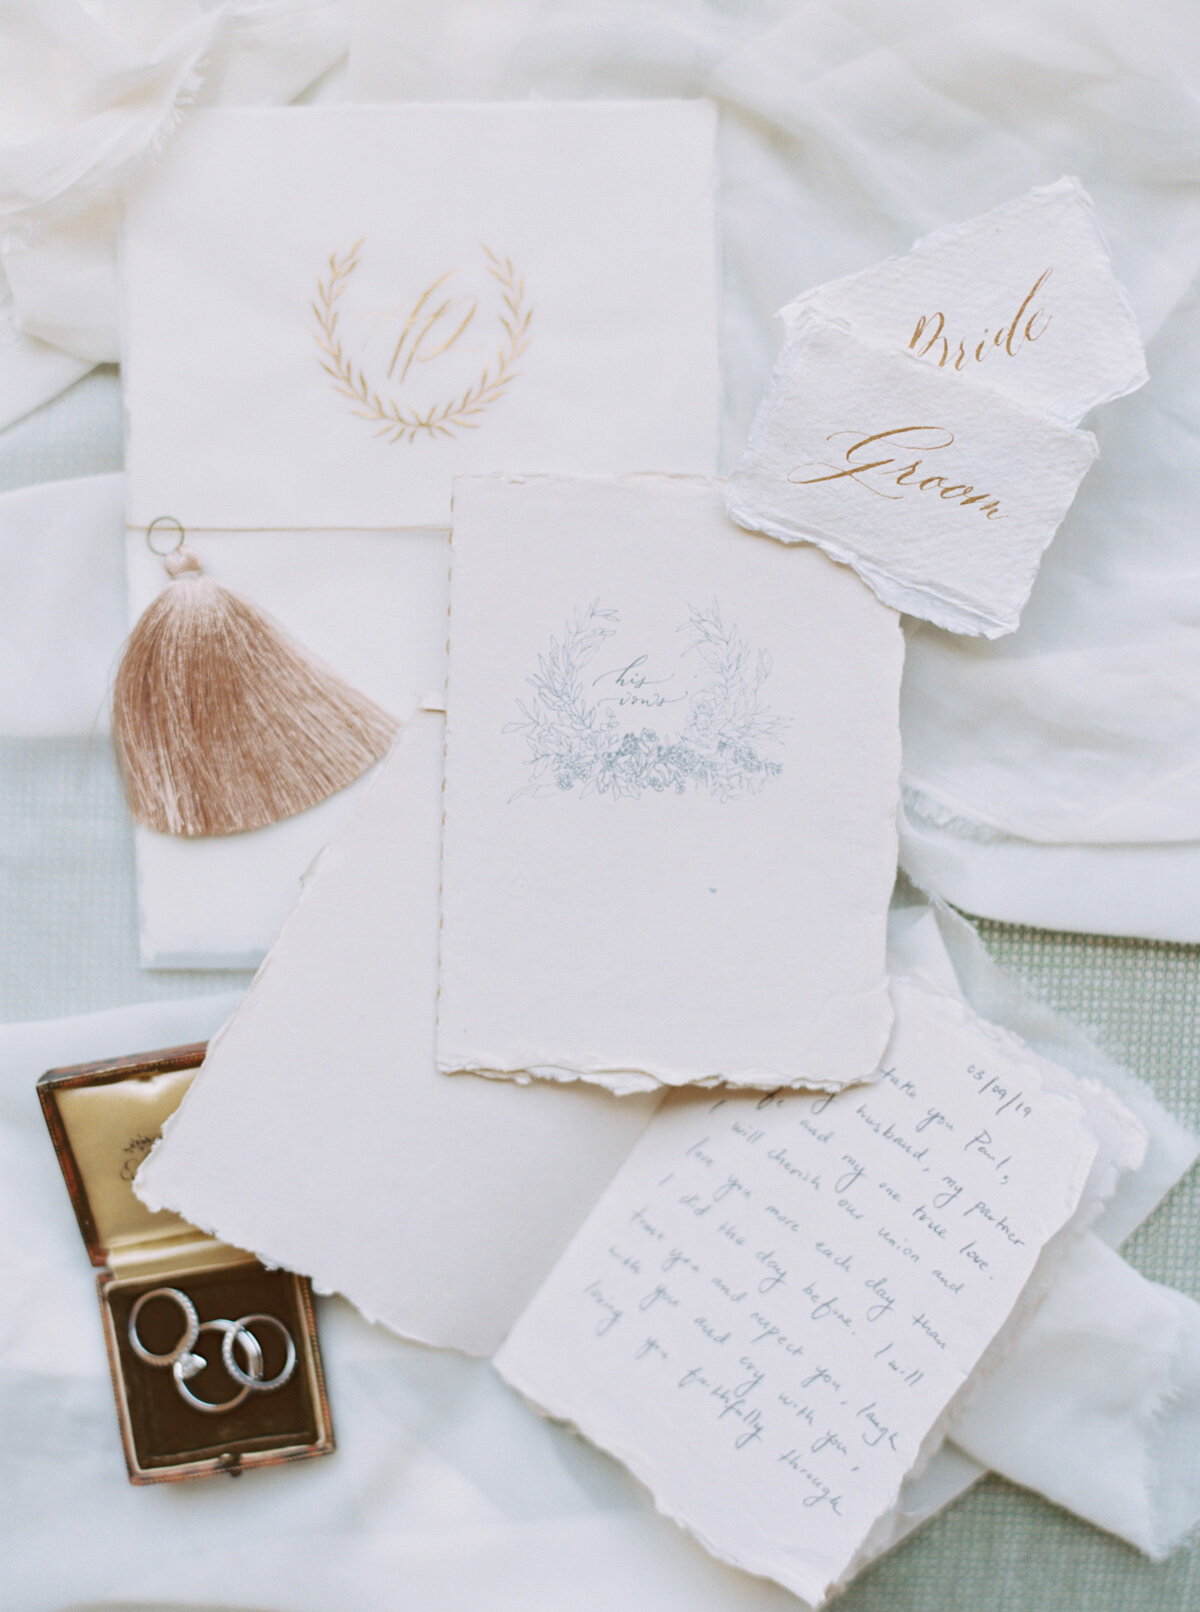 Belmond-Hotel-Caruso-ravello-elopement-Katie-Grant-destination-wedding (7 of 50).jpg